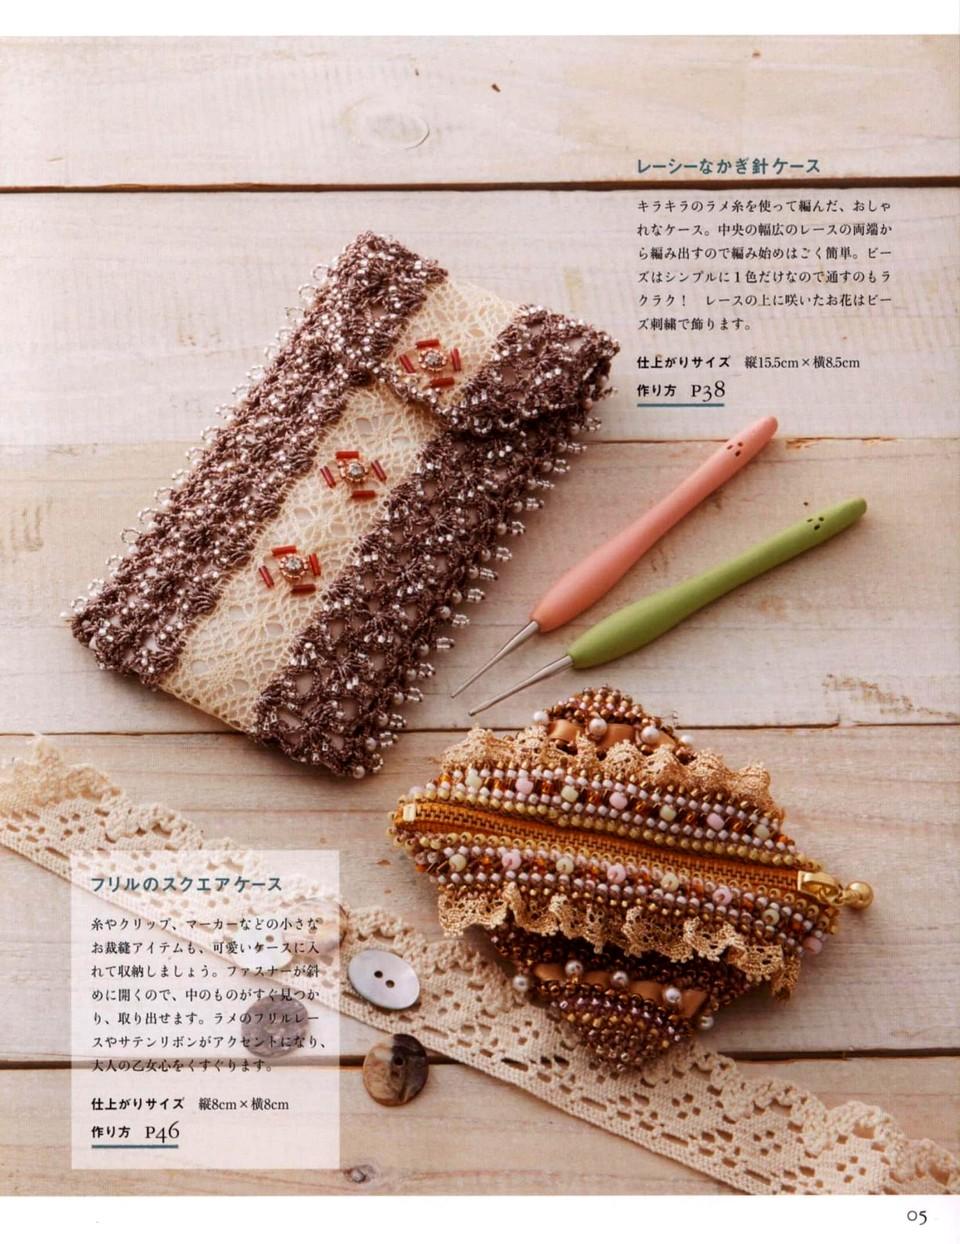 717 Beads Crochet 17-06